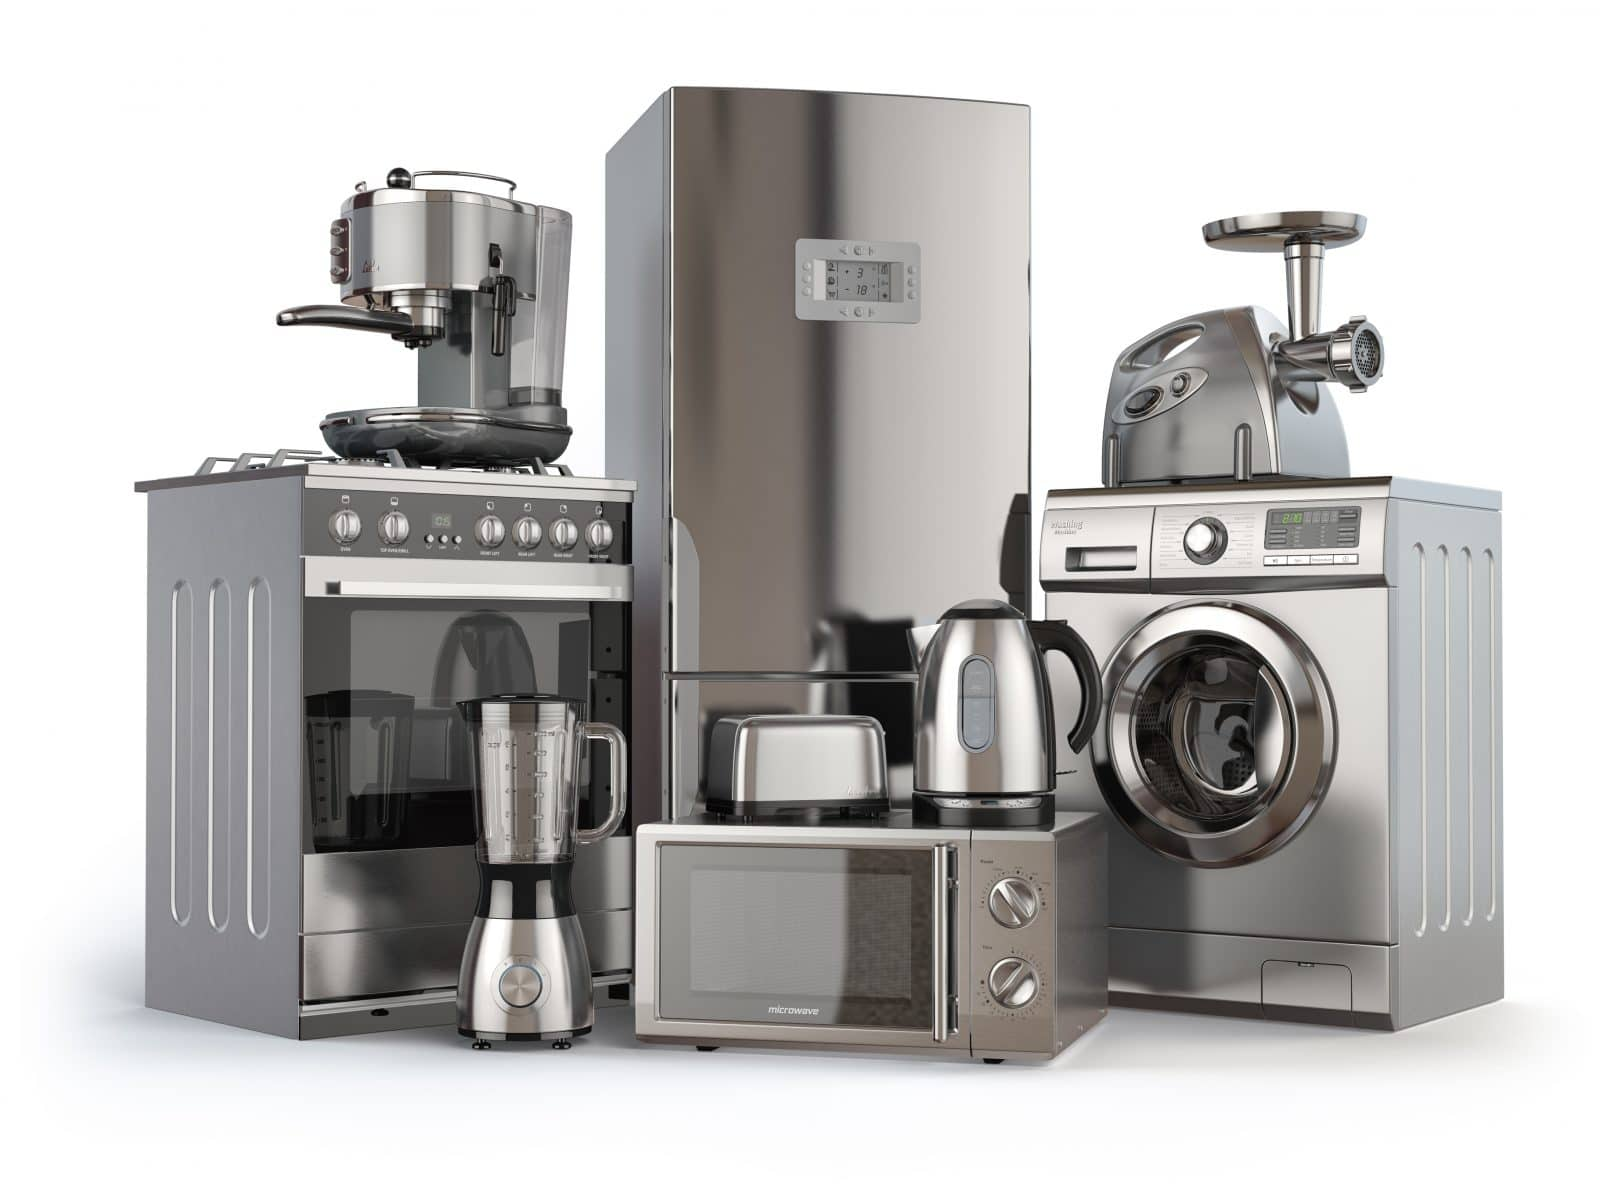 rjv-home-design-refurbishment-london-61141d3798bf5